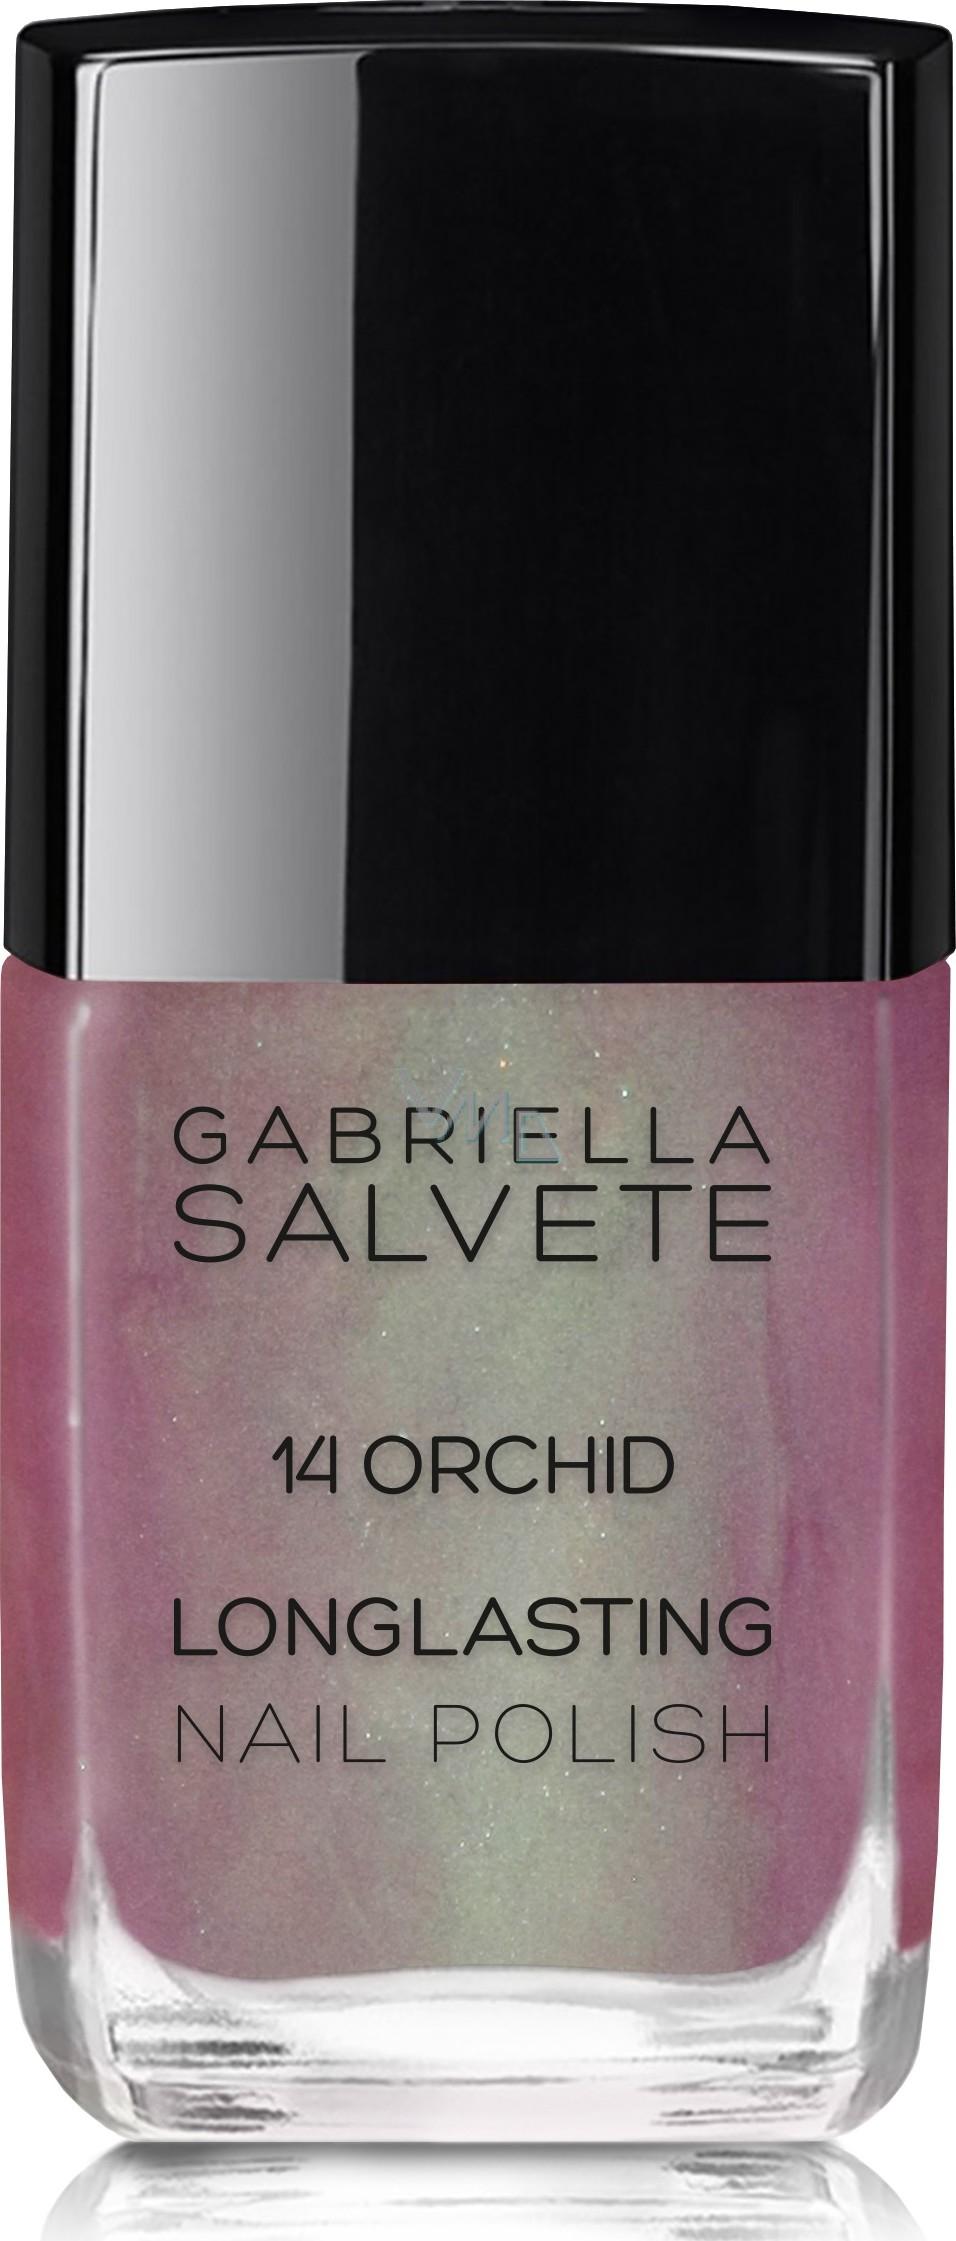 Gabriella Salvete Longlasting Enamel Lak Na Nehty 14 Orchid 11 Ml Vmd Drogerie A Parfumerie